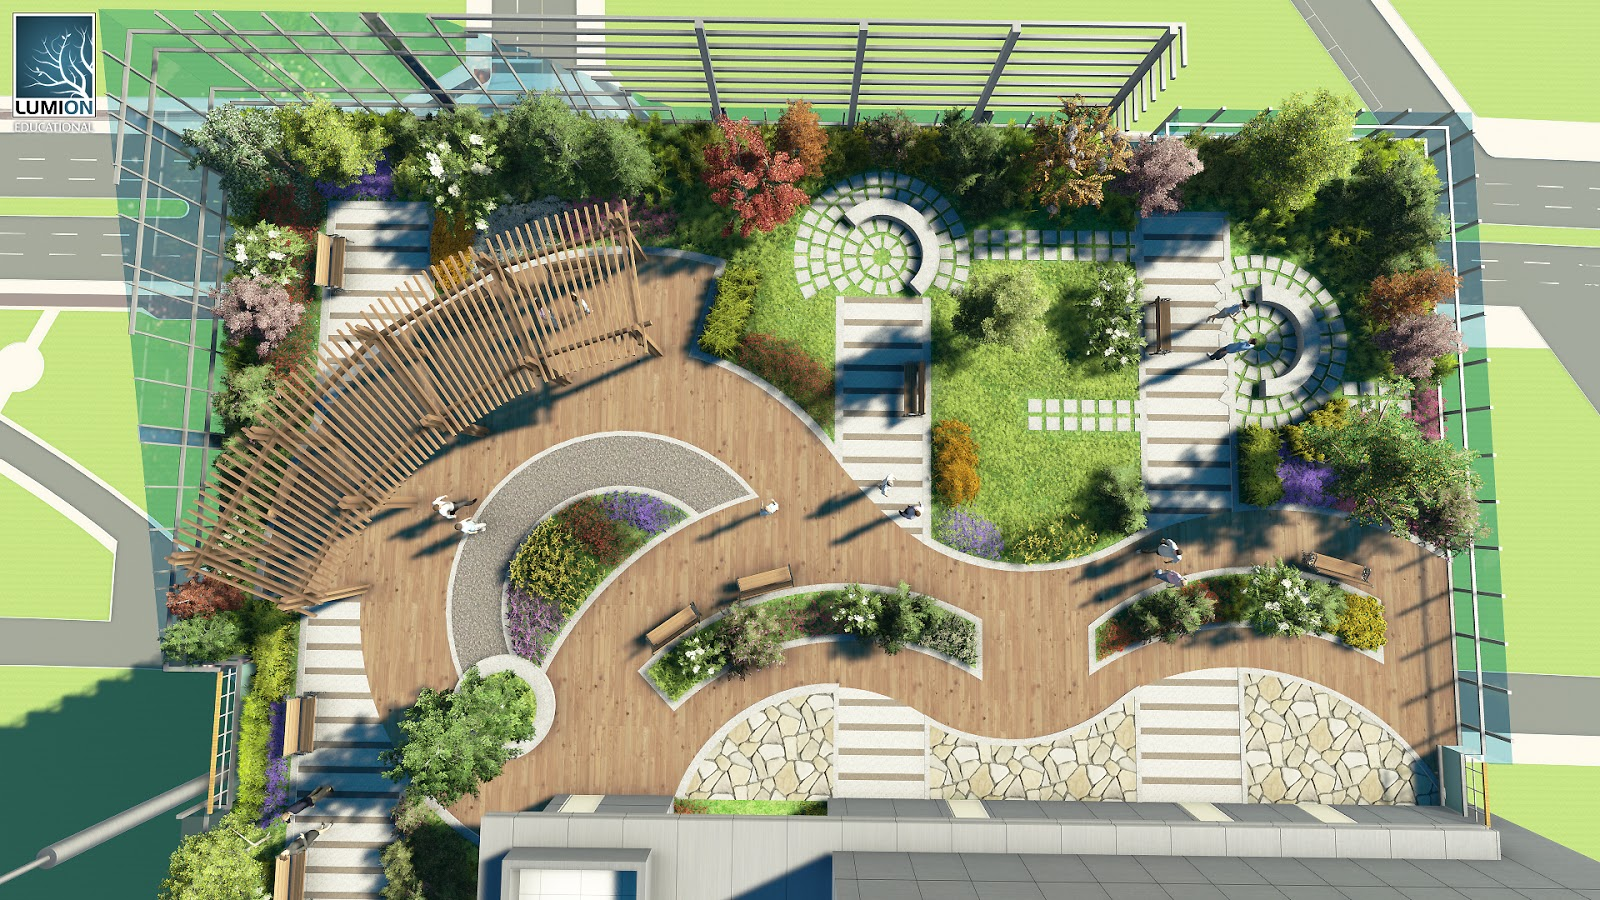 20 Desain Roof Garden Rumah Minimalis